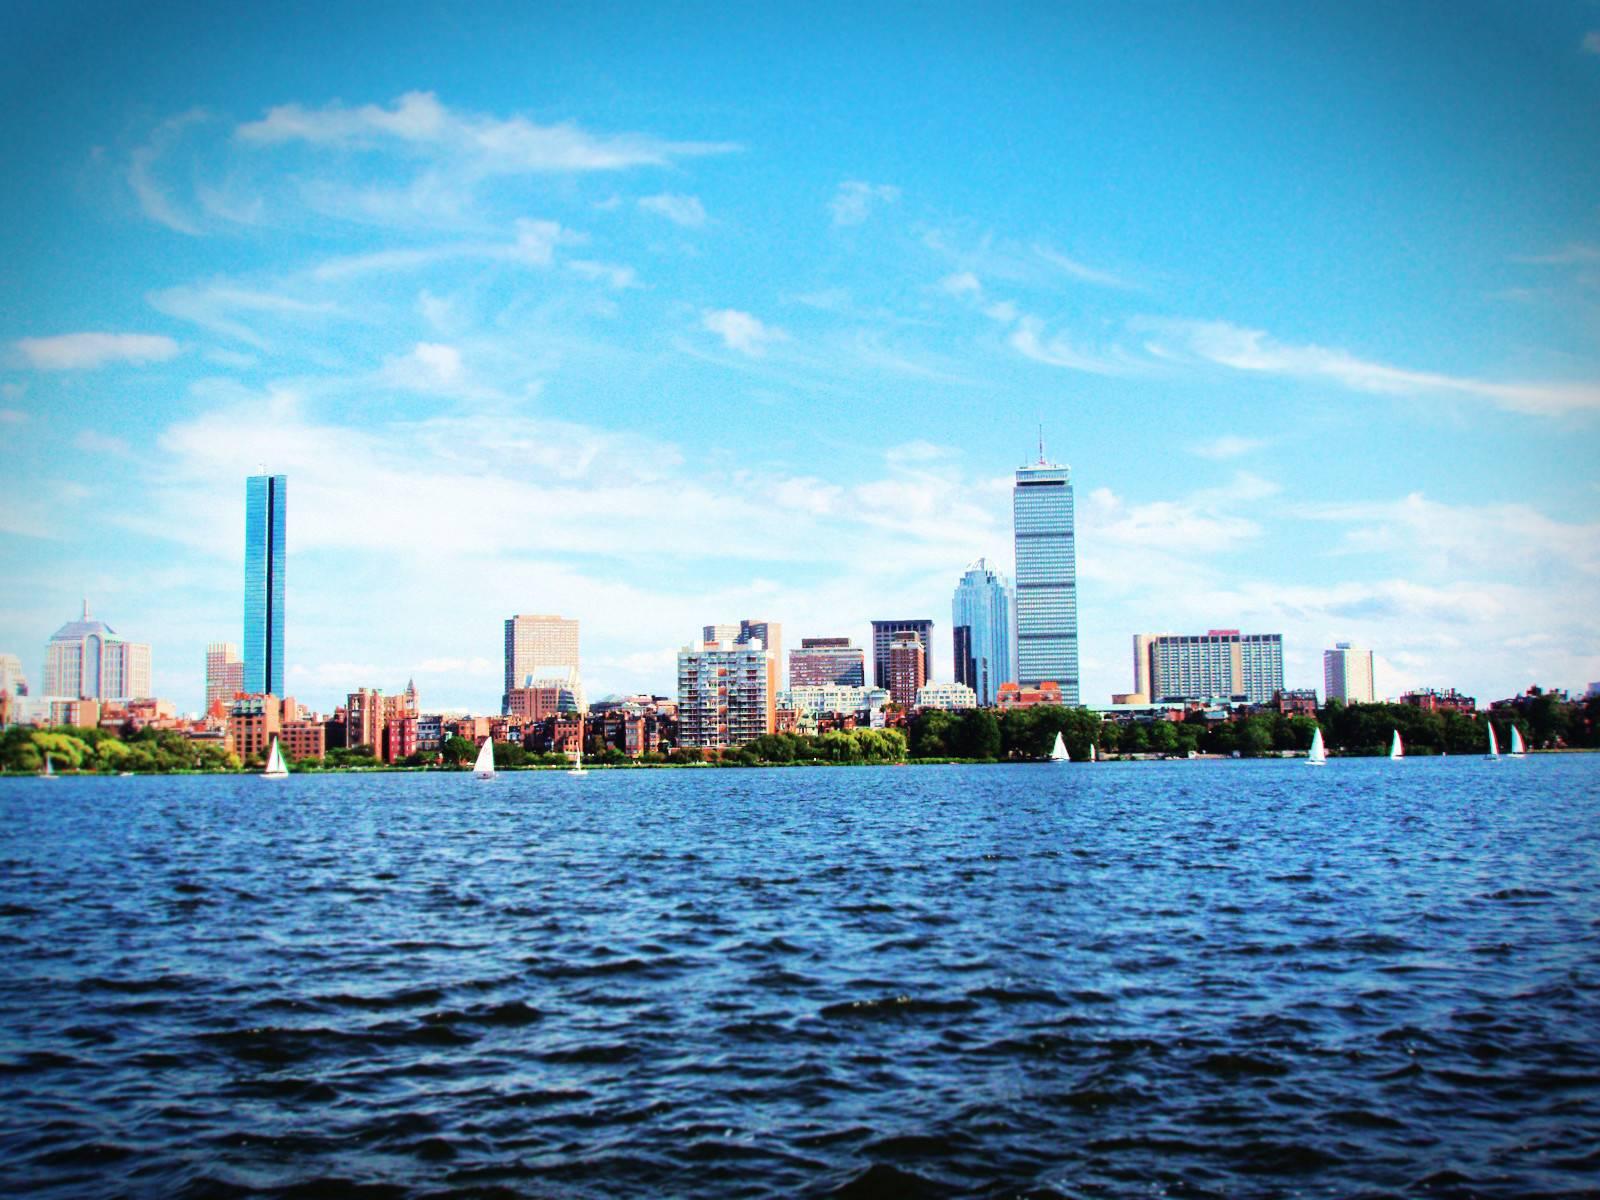 5-Day East Coast Budget Tour: New York, Philadelphia, D.C. & Niagara Falls